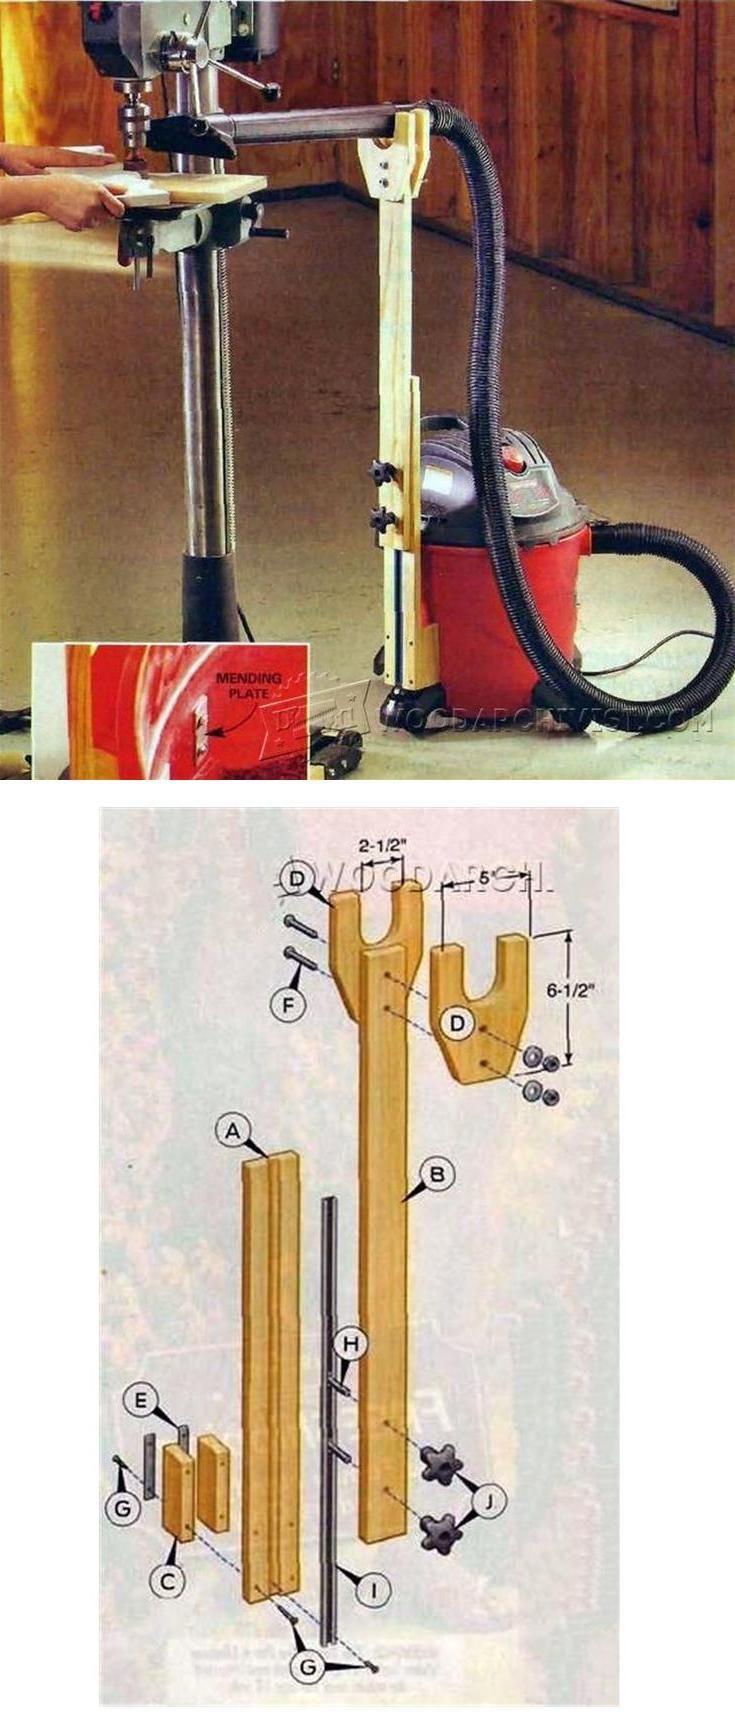 DIY Adjustable Dust Control - Dust Collection Tips, Jigs and Fixtures | WoodArchivist.com